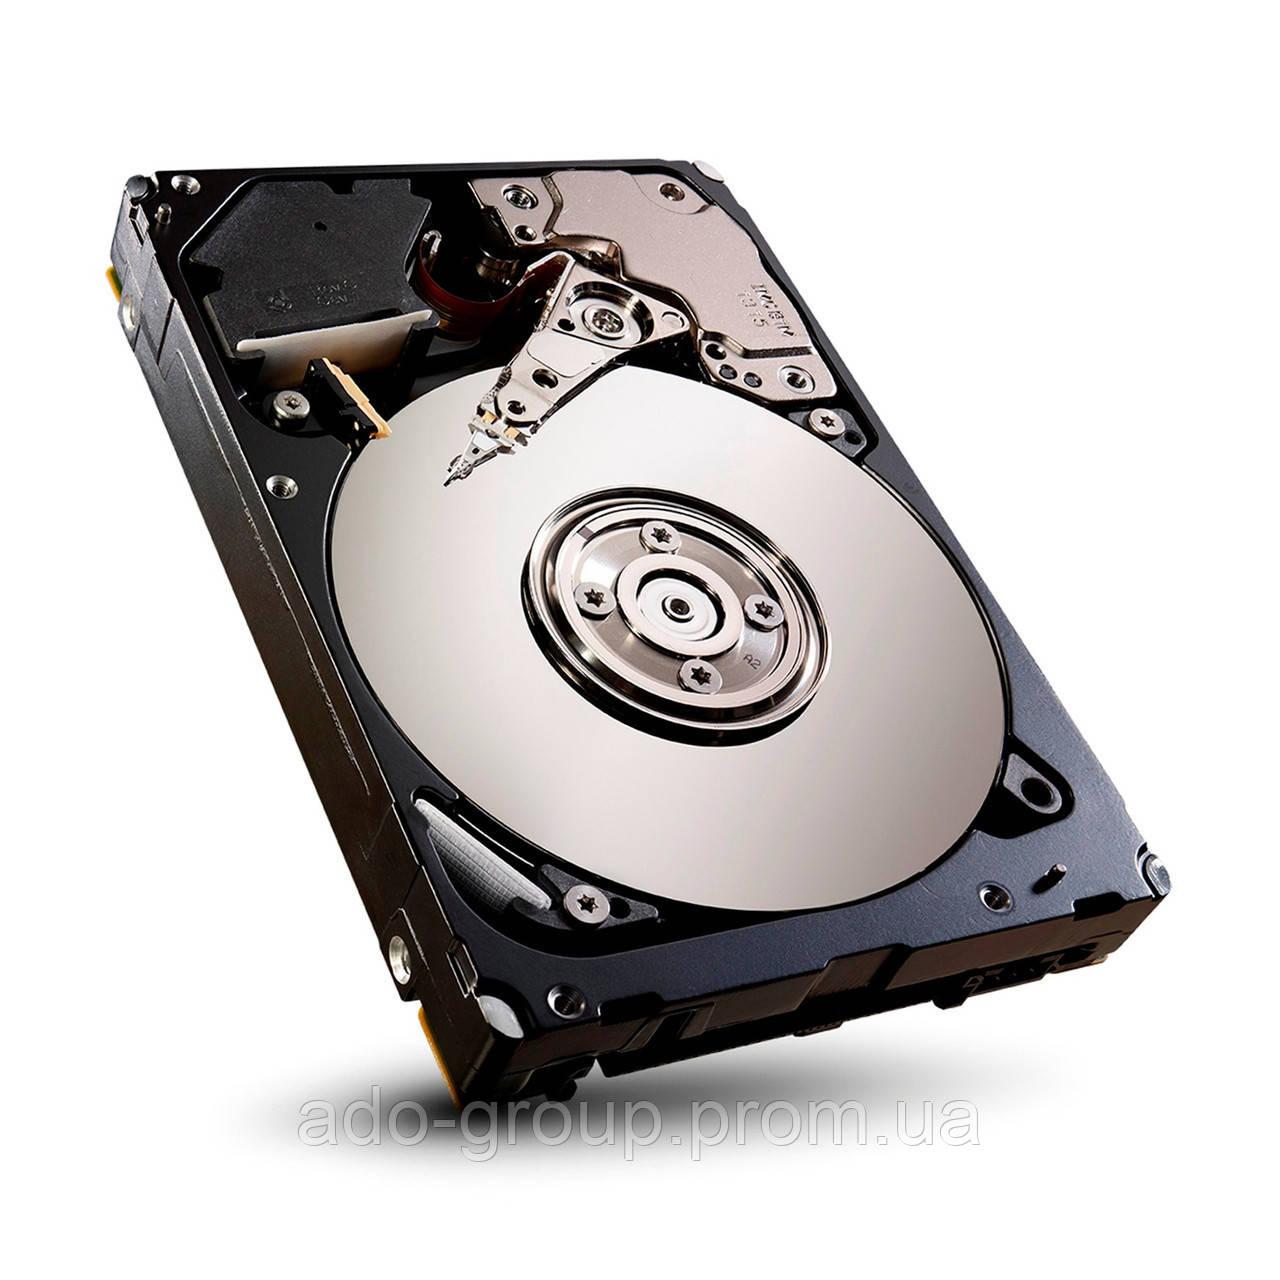 "42D0519 Жесткий диск IBM 450GB SAS 15K  3.5"" +"